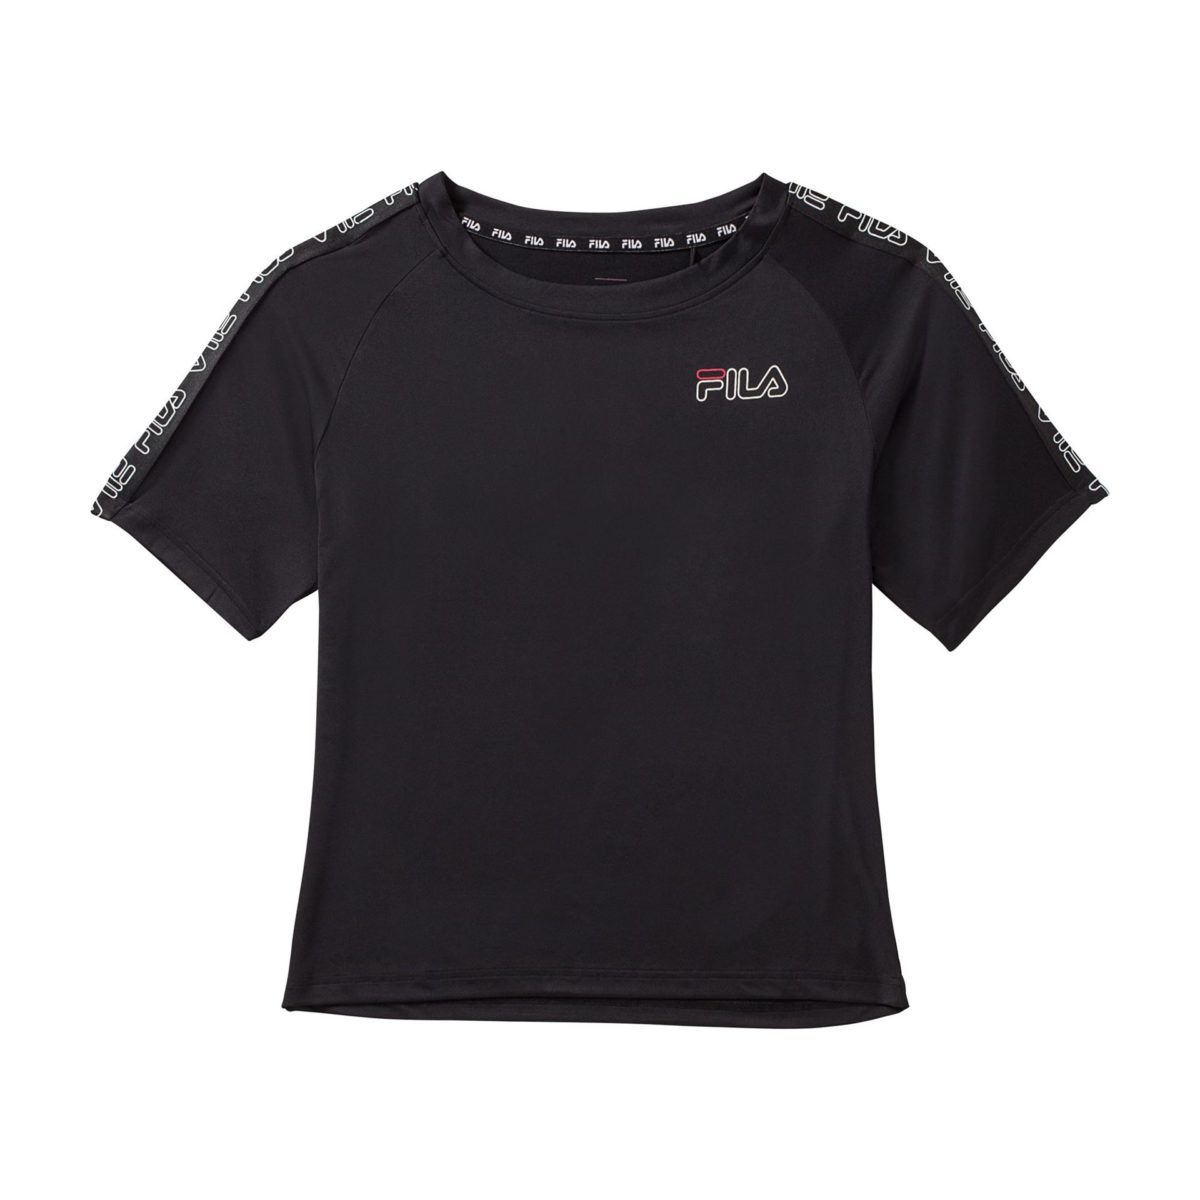 T-Shirt Fila Women Adel Tee Loose Fit